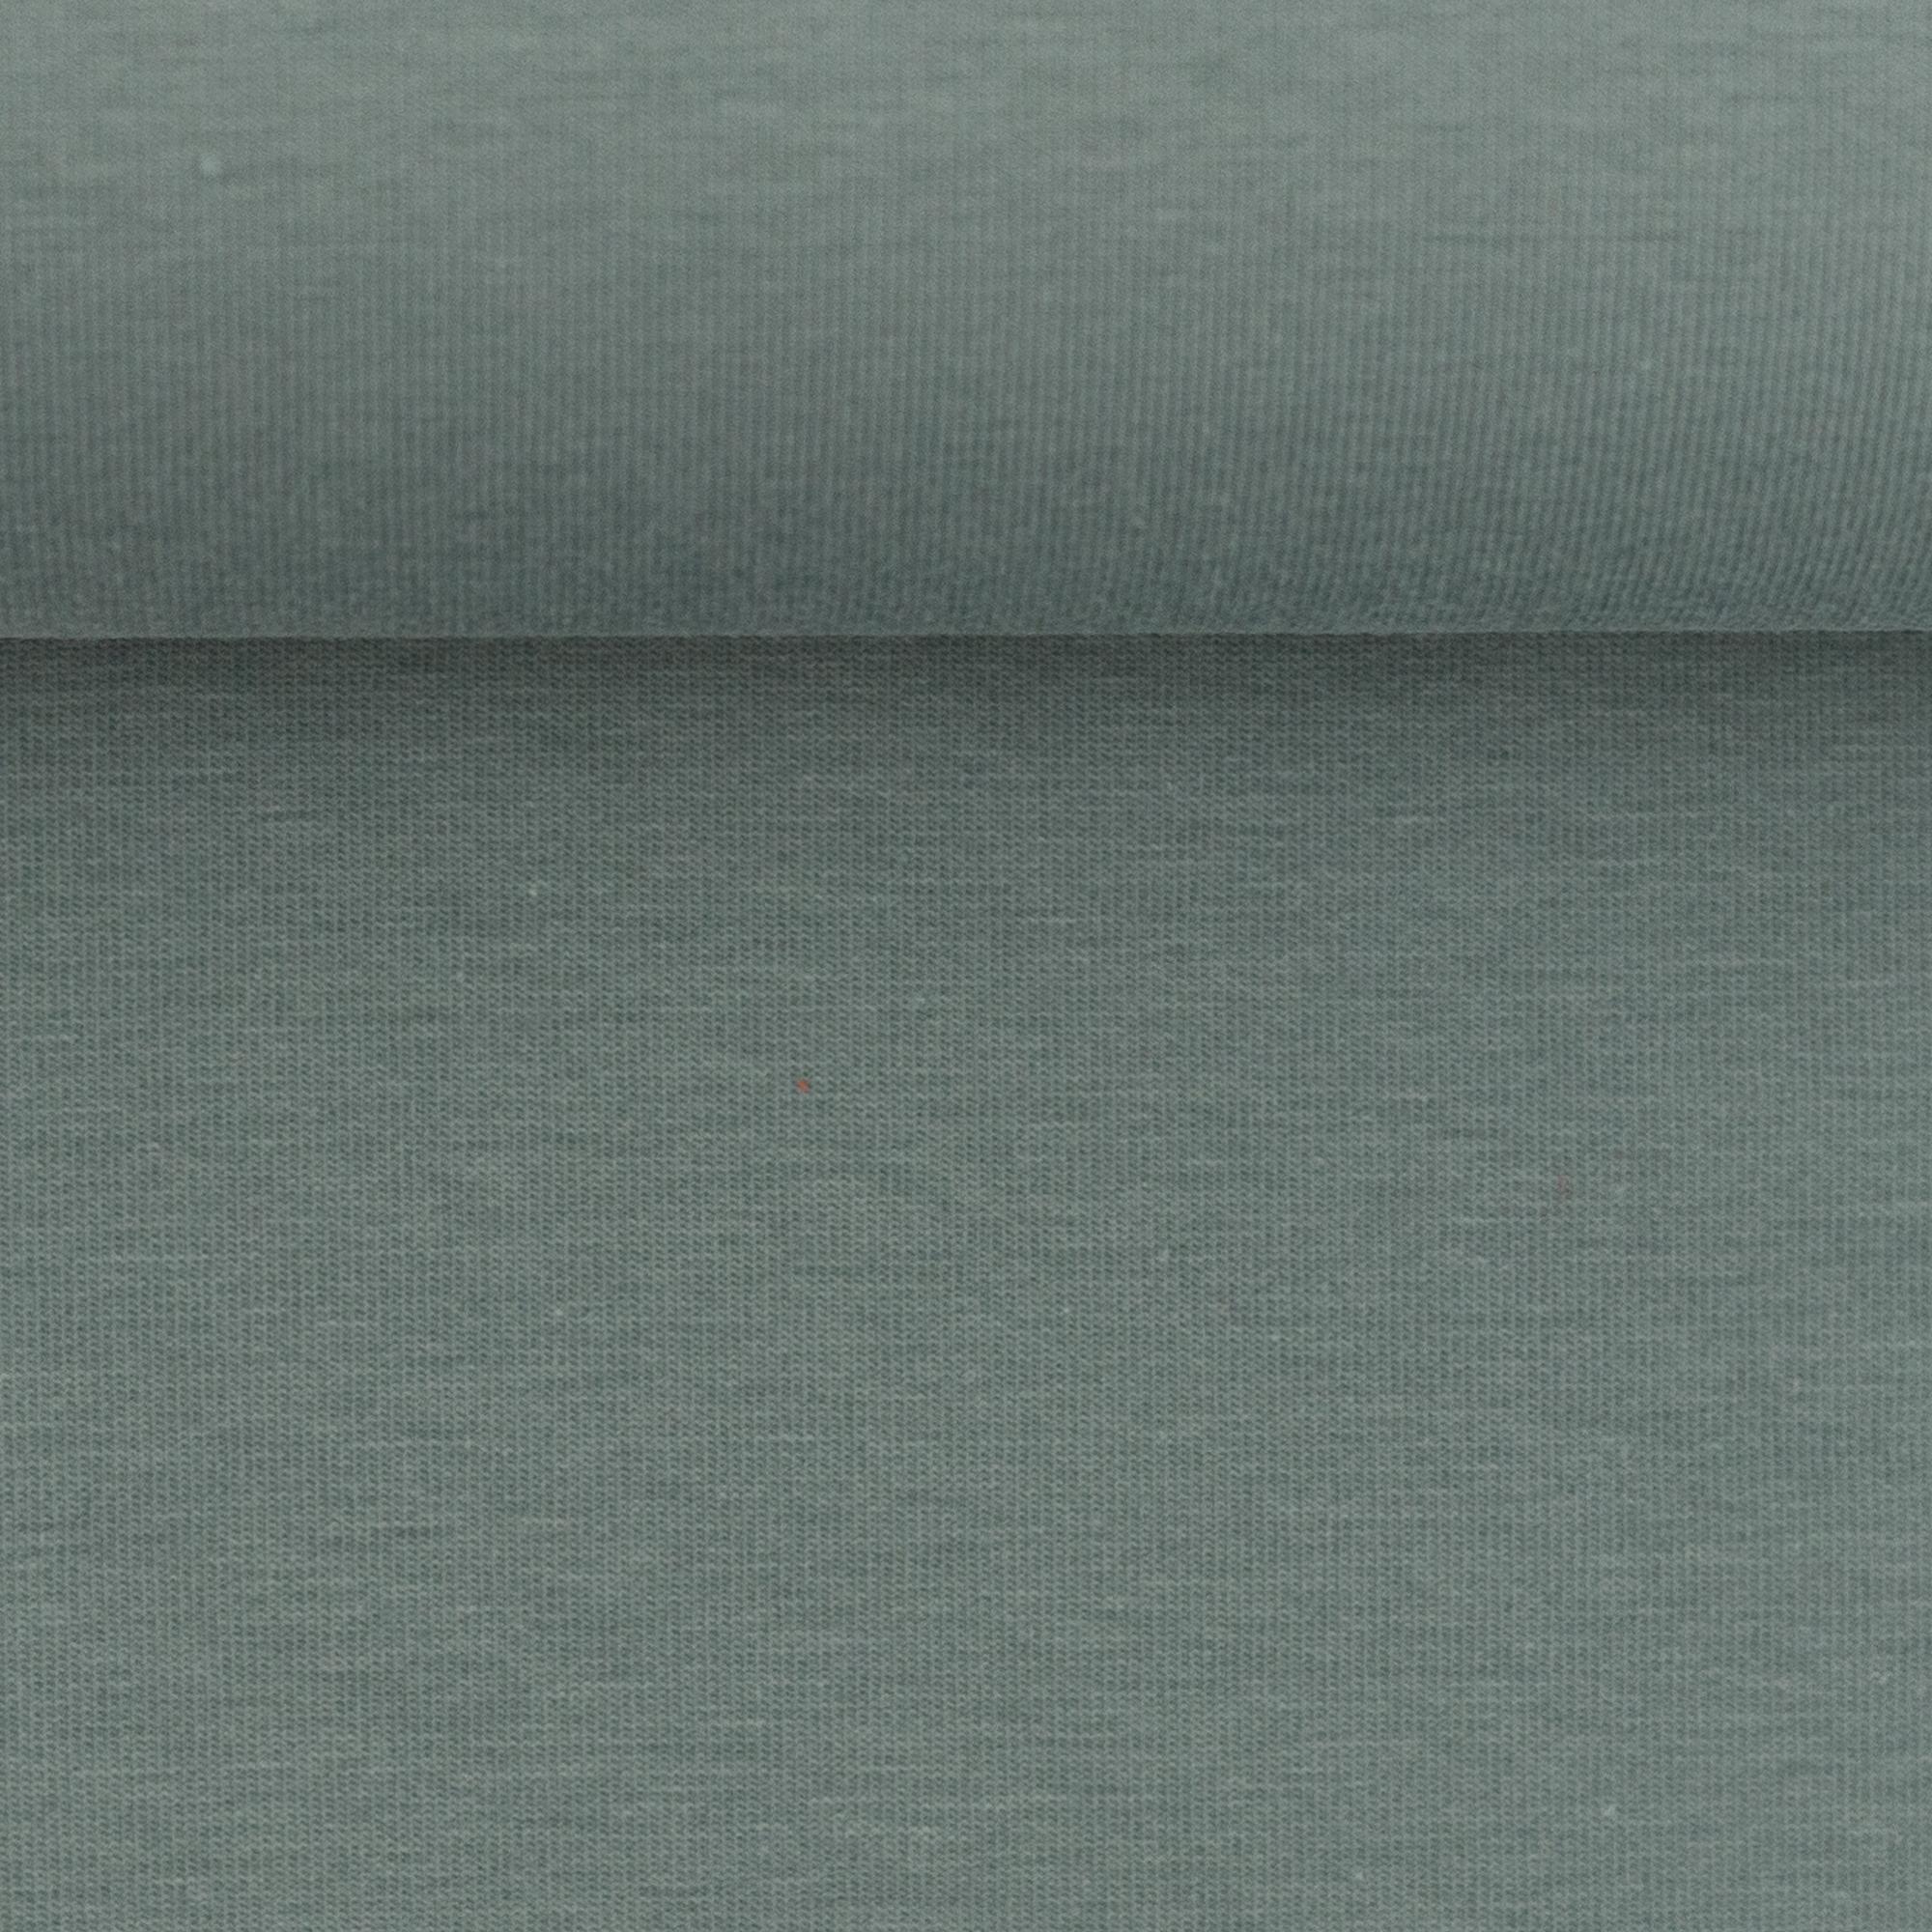 Baumwoll Jersey - Jersey Stoff - Swafing - Vanessa - Uni - Graugrün